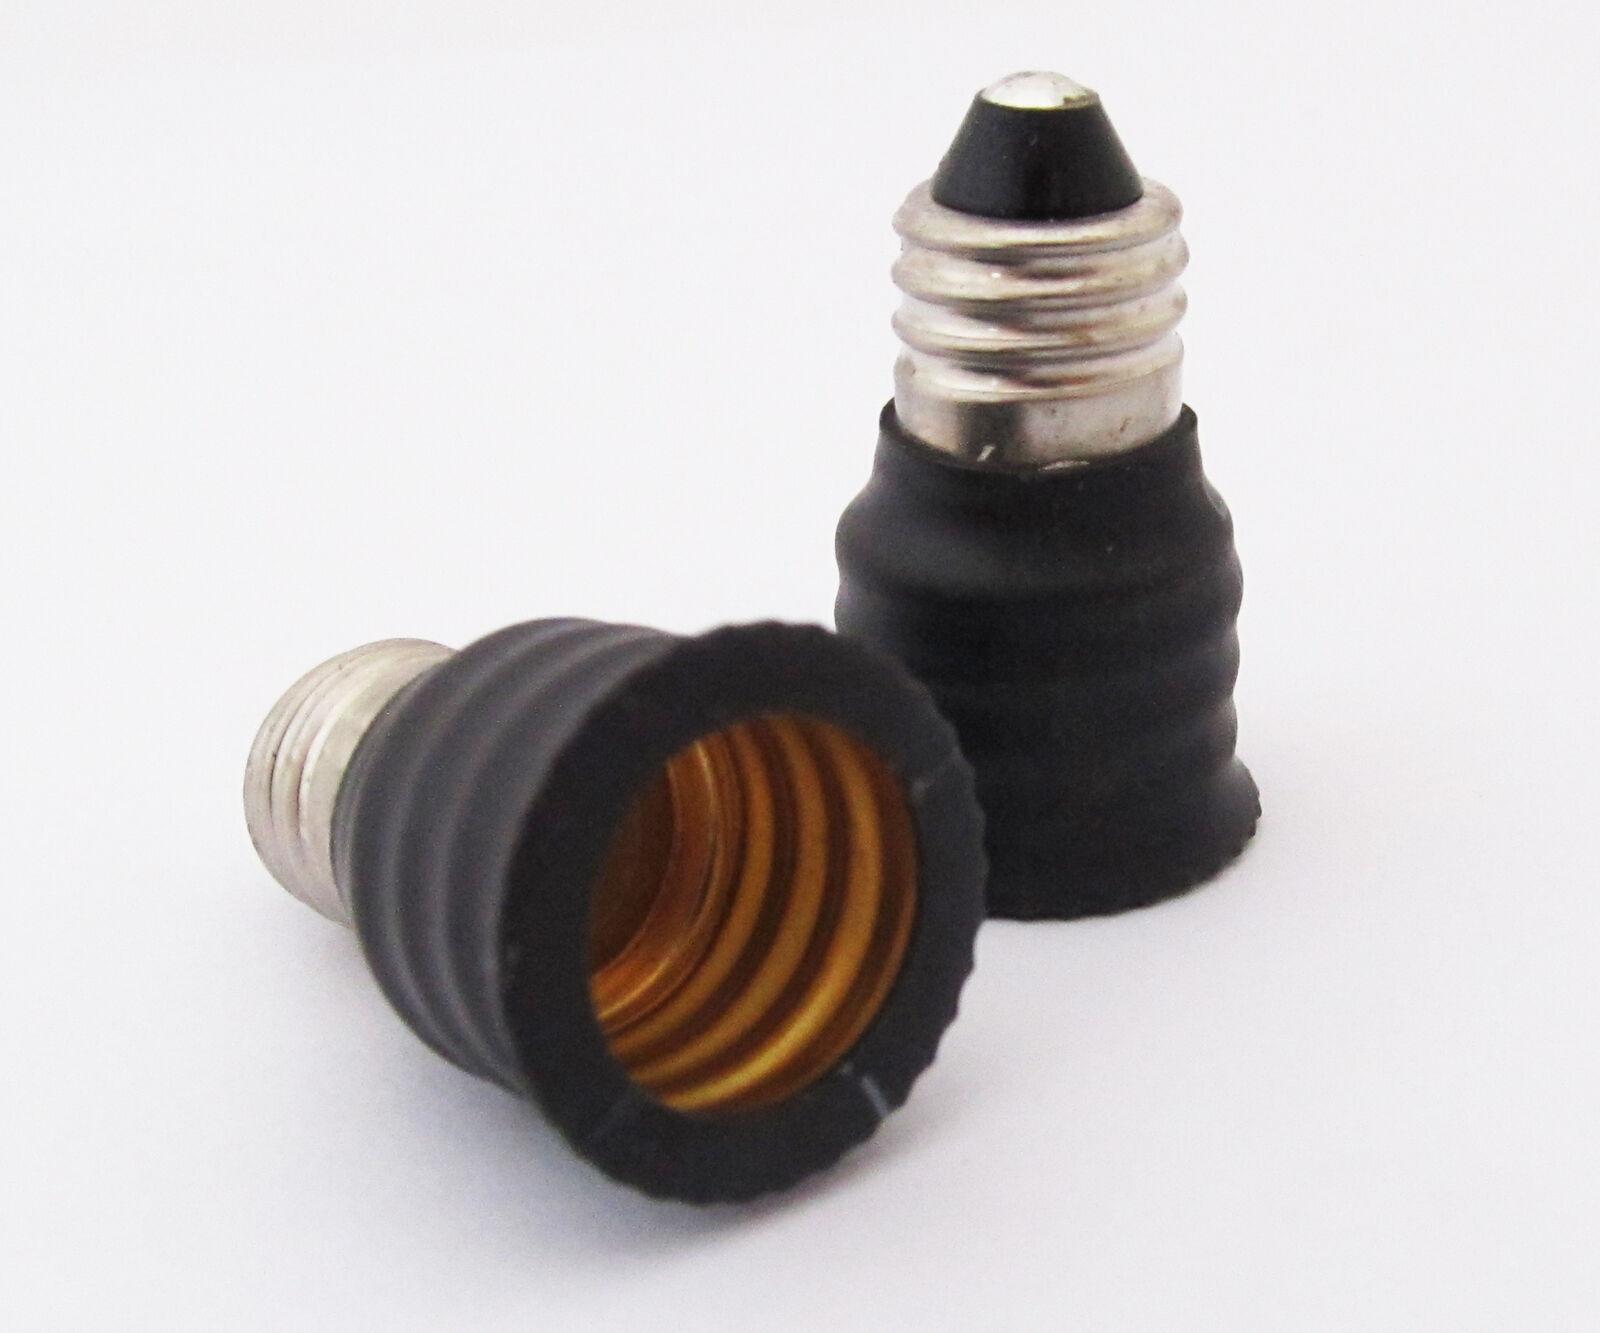 4pcs E11 Male to E14 Female Base LED Light Bulb Adapter Holder Socket Converter